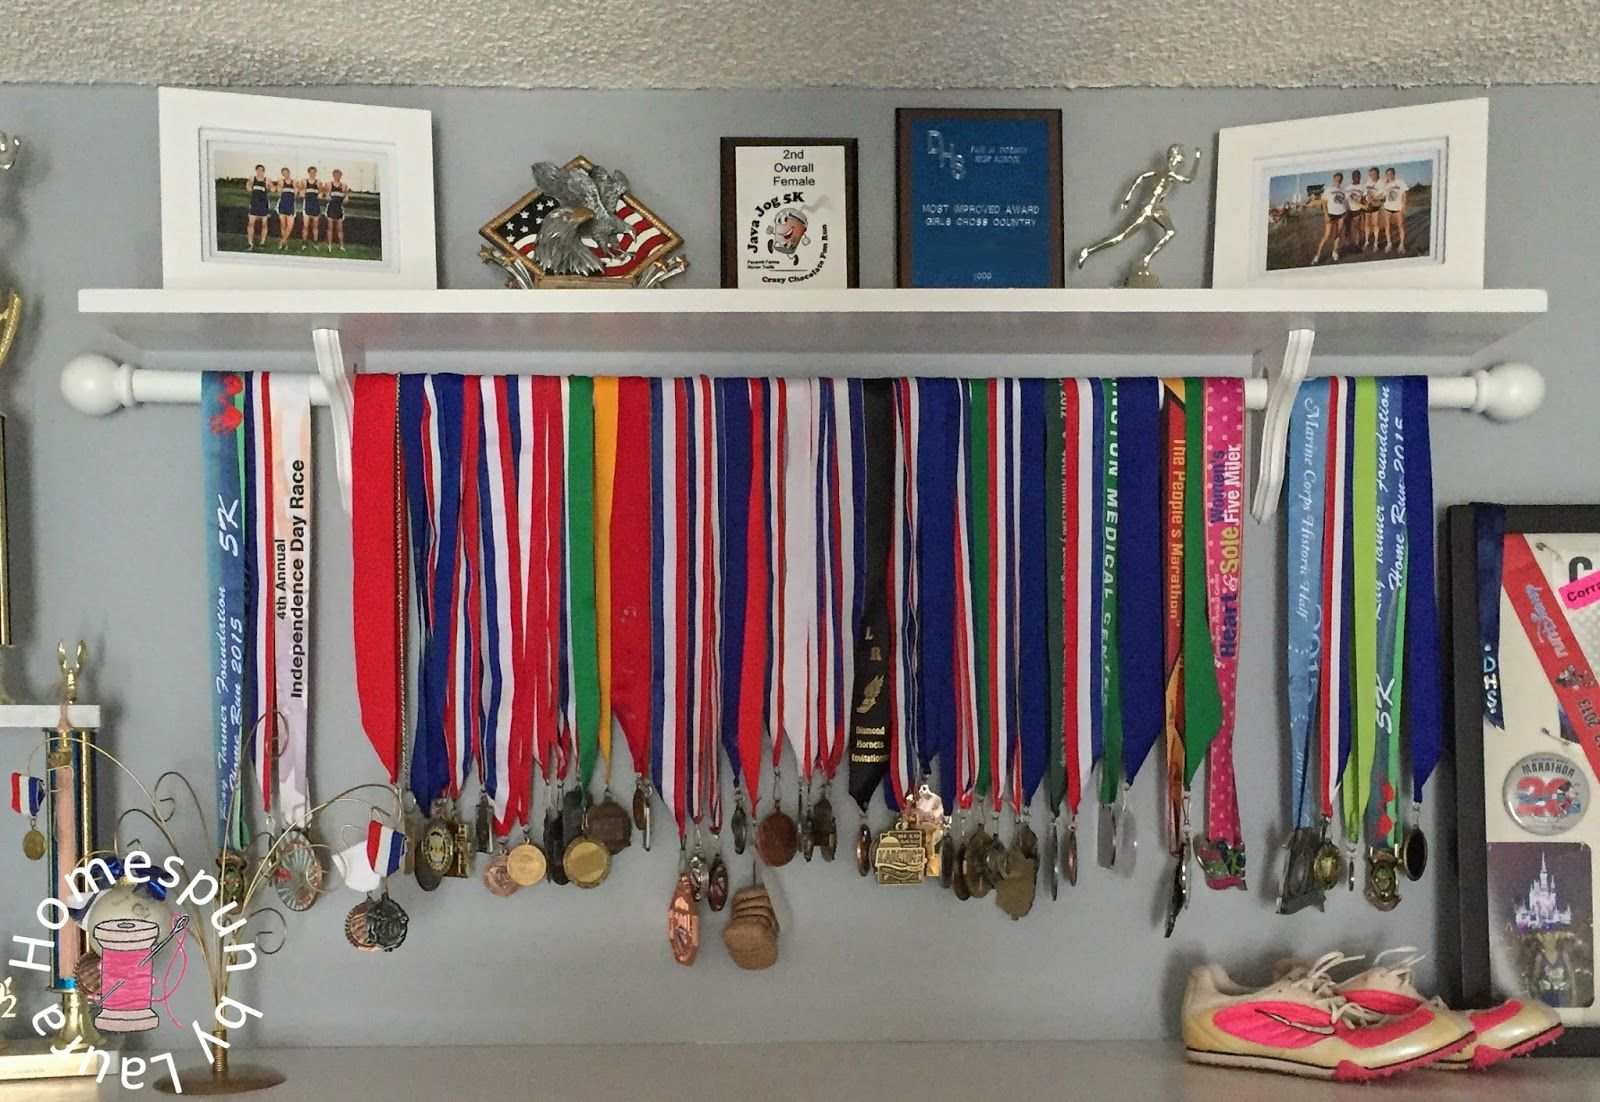 Diy Running Medal Display Shelf How To Display Athletic